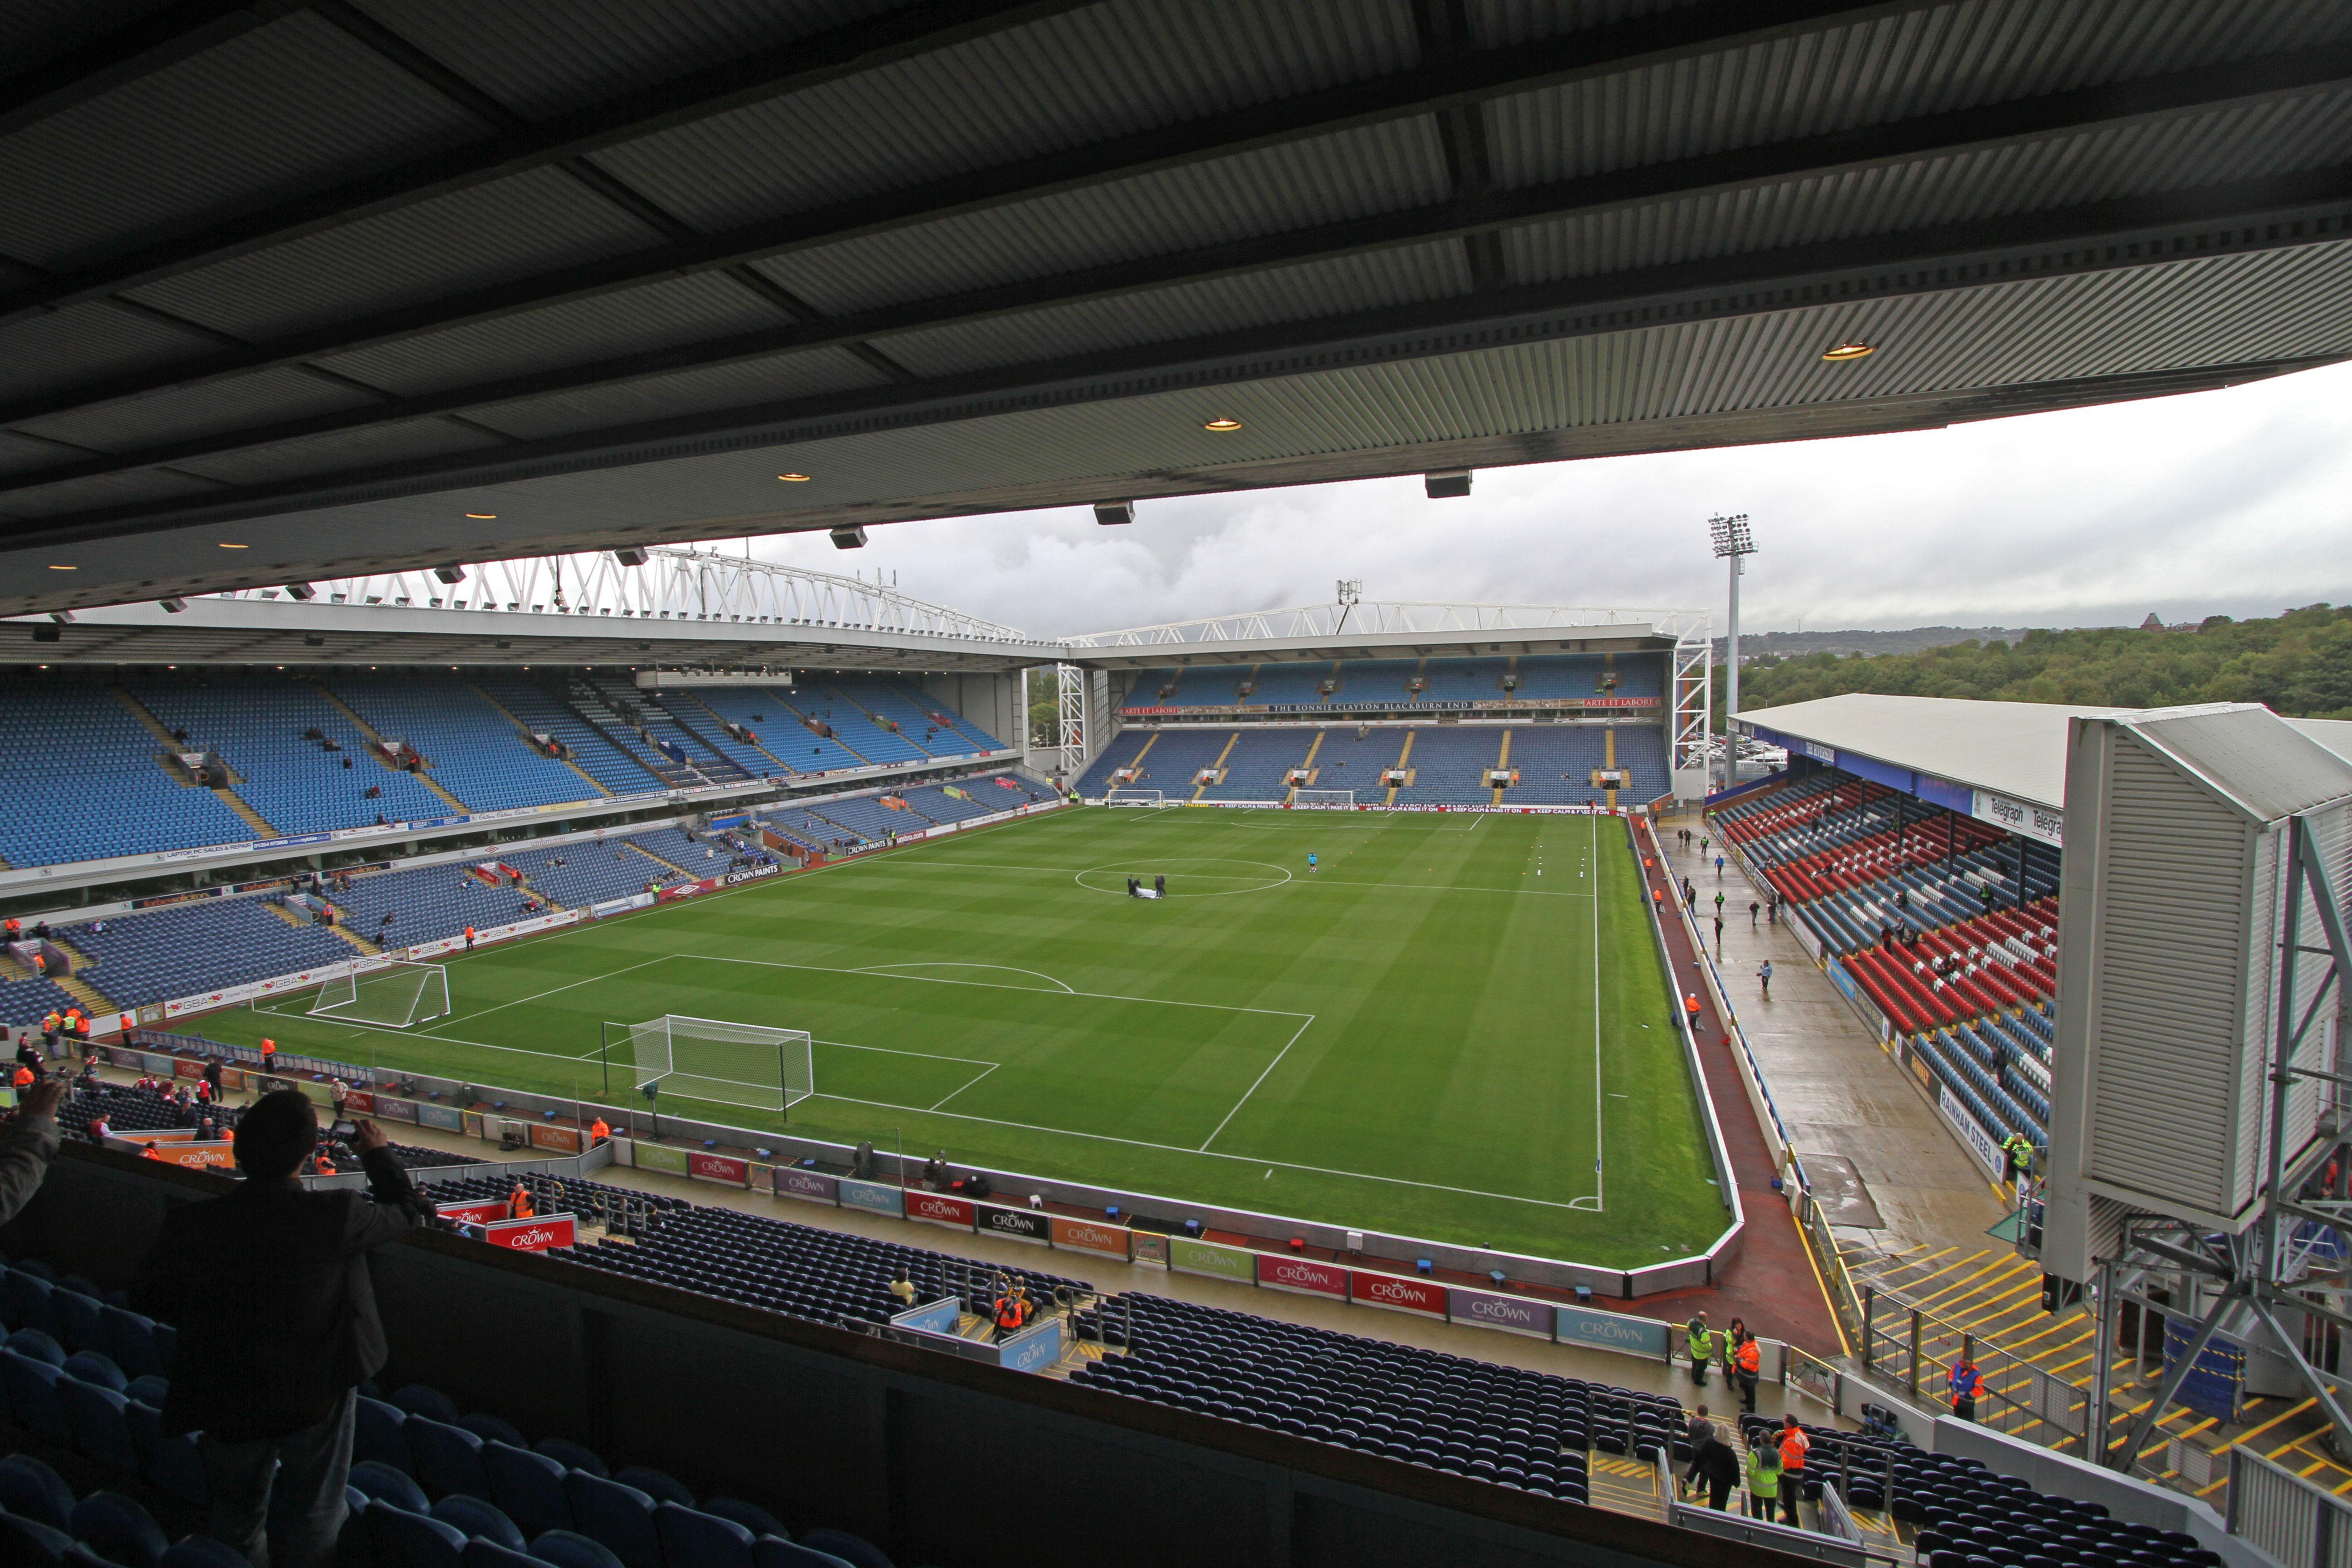 Pin By 10 Eresiak On Football Grounds I Ve Visited English Football Stadiums Blackburn Rovers Blackburn